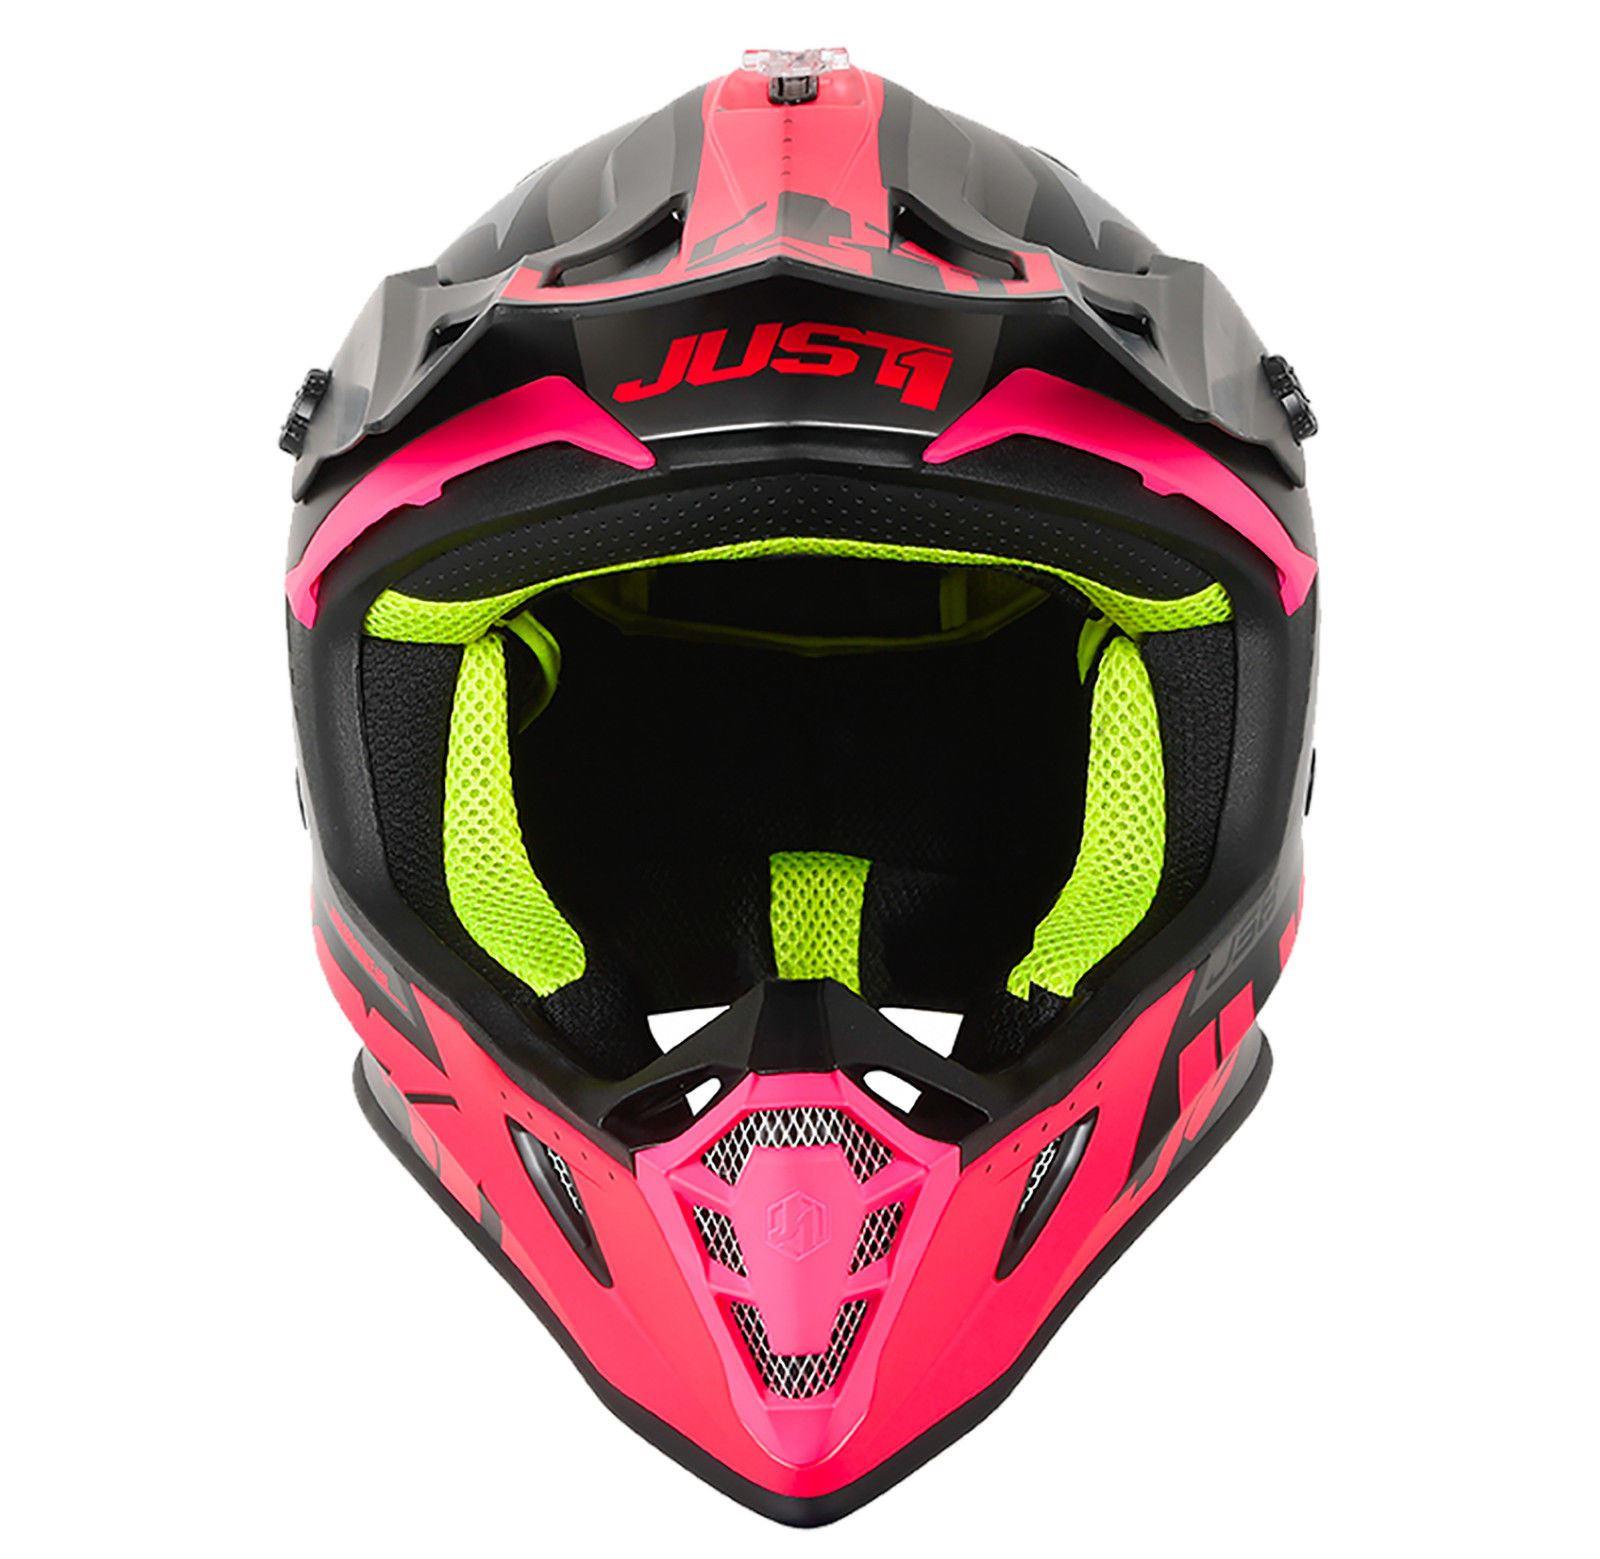 Just1-J38-Blade-Helmet-Motocross-Enduro-MX-ATV-Motorcycle-Off-Road-Full-Face-ACU thumbnail 27